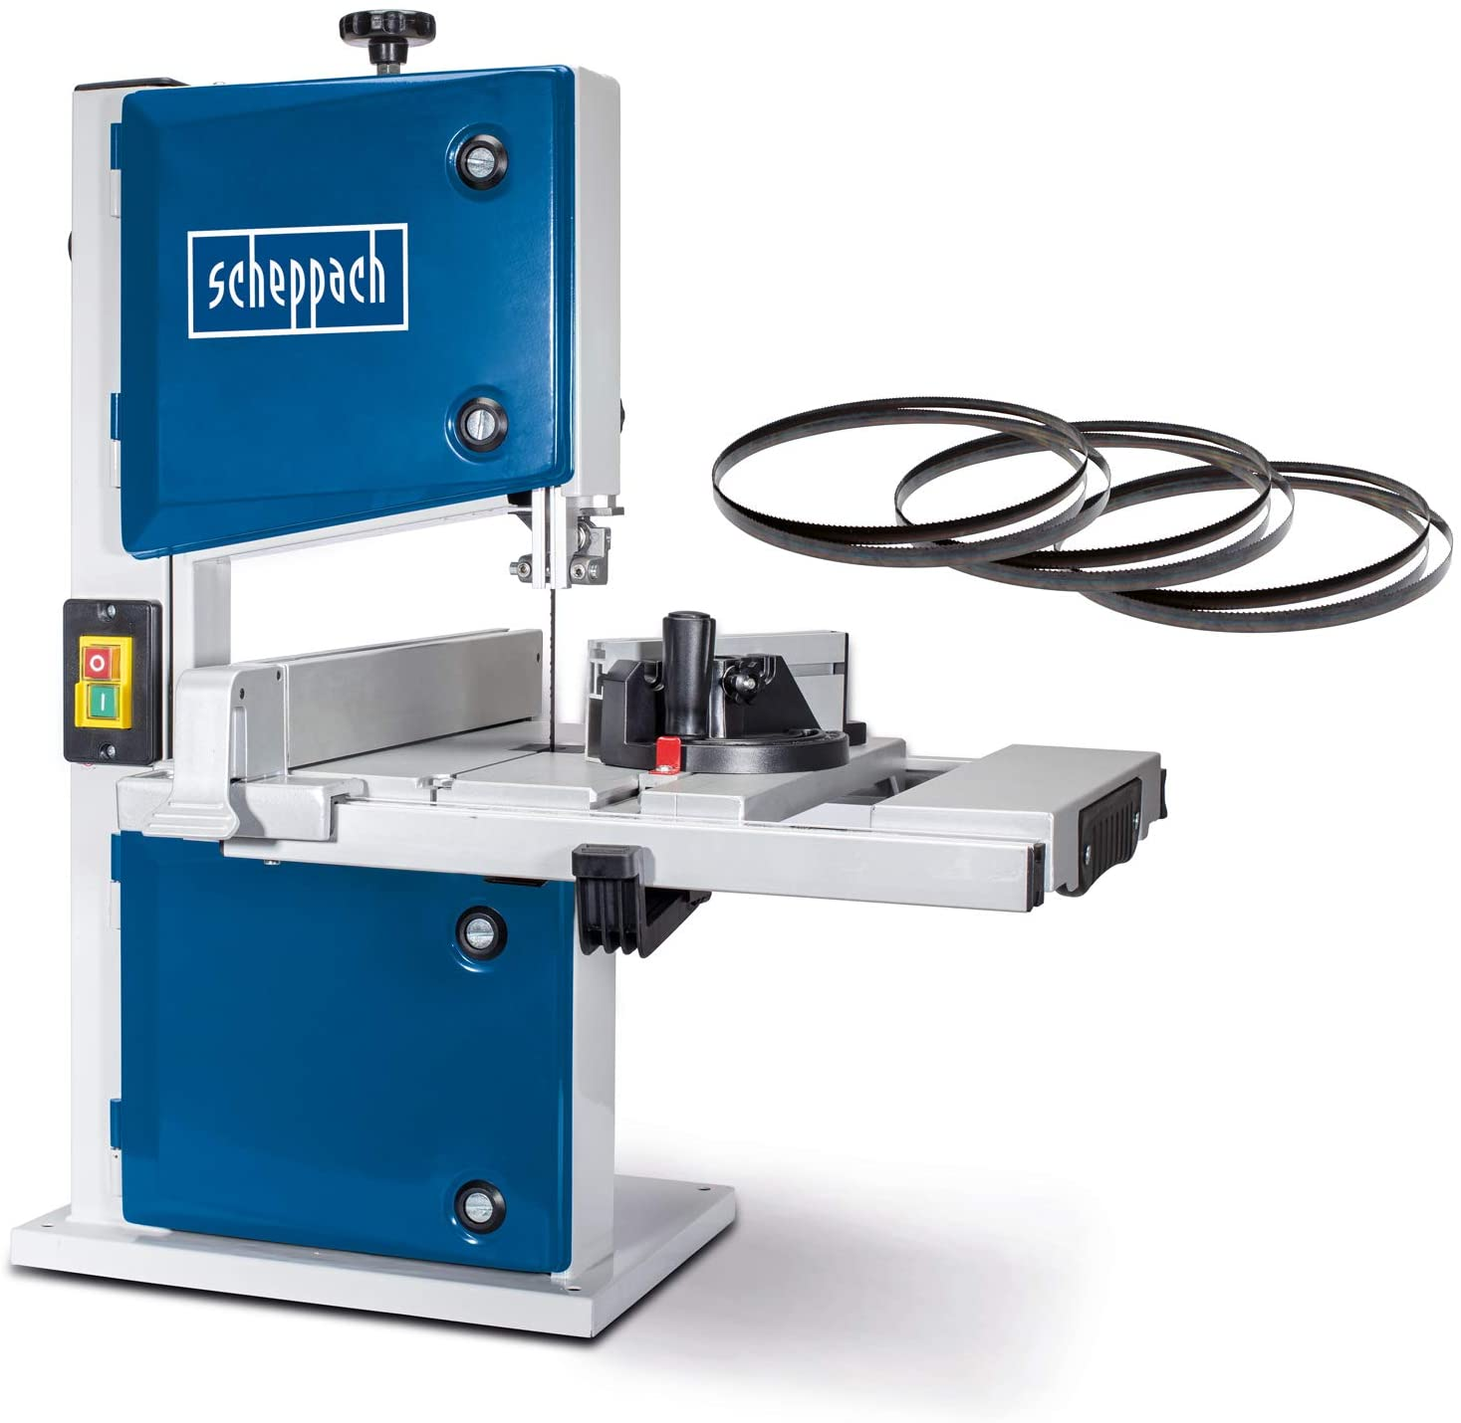 Scheppach 5901501905 HBS30-Sierra Madera (Incluye 3 Cintas de Sierra 230 V, 350 W, Altura 80 mm. Máx. Ancho de Paso: 200 mm, Azul